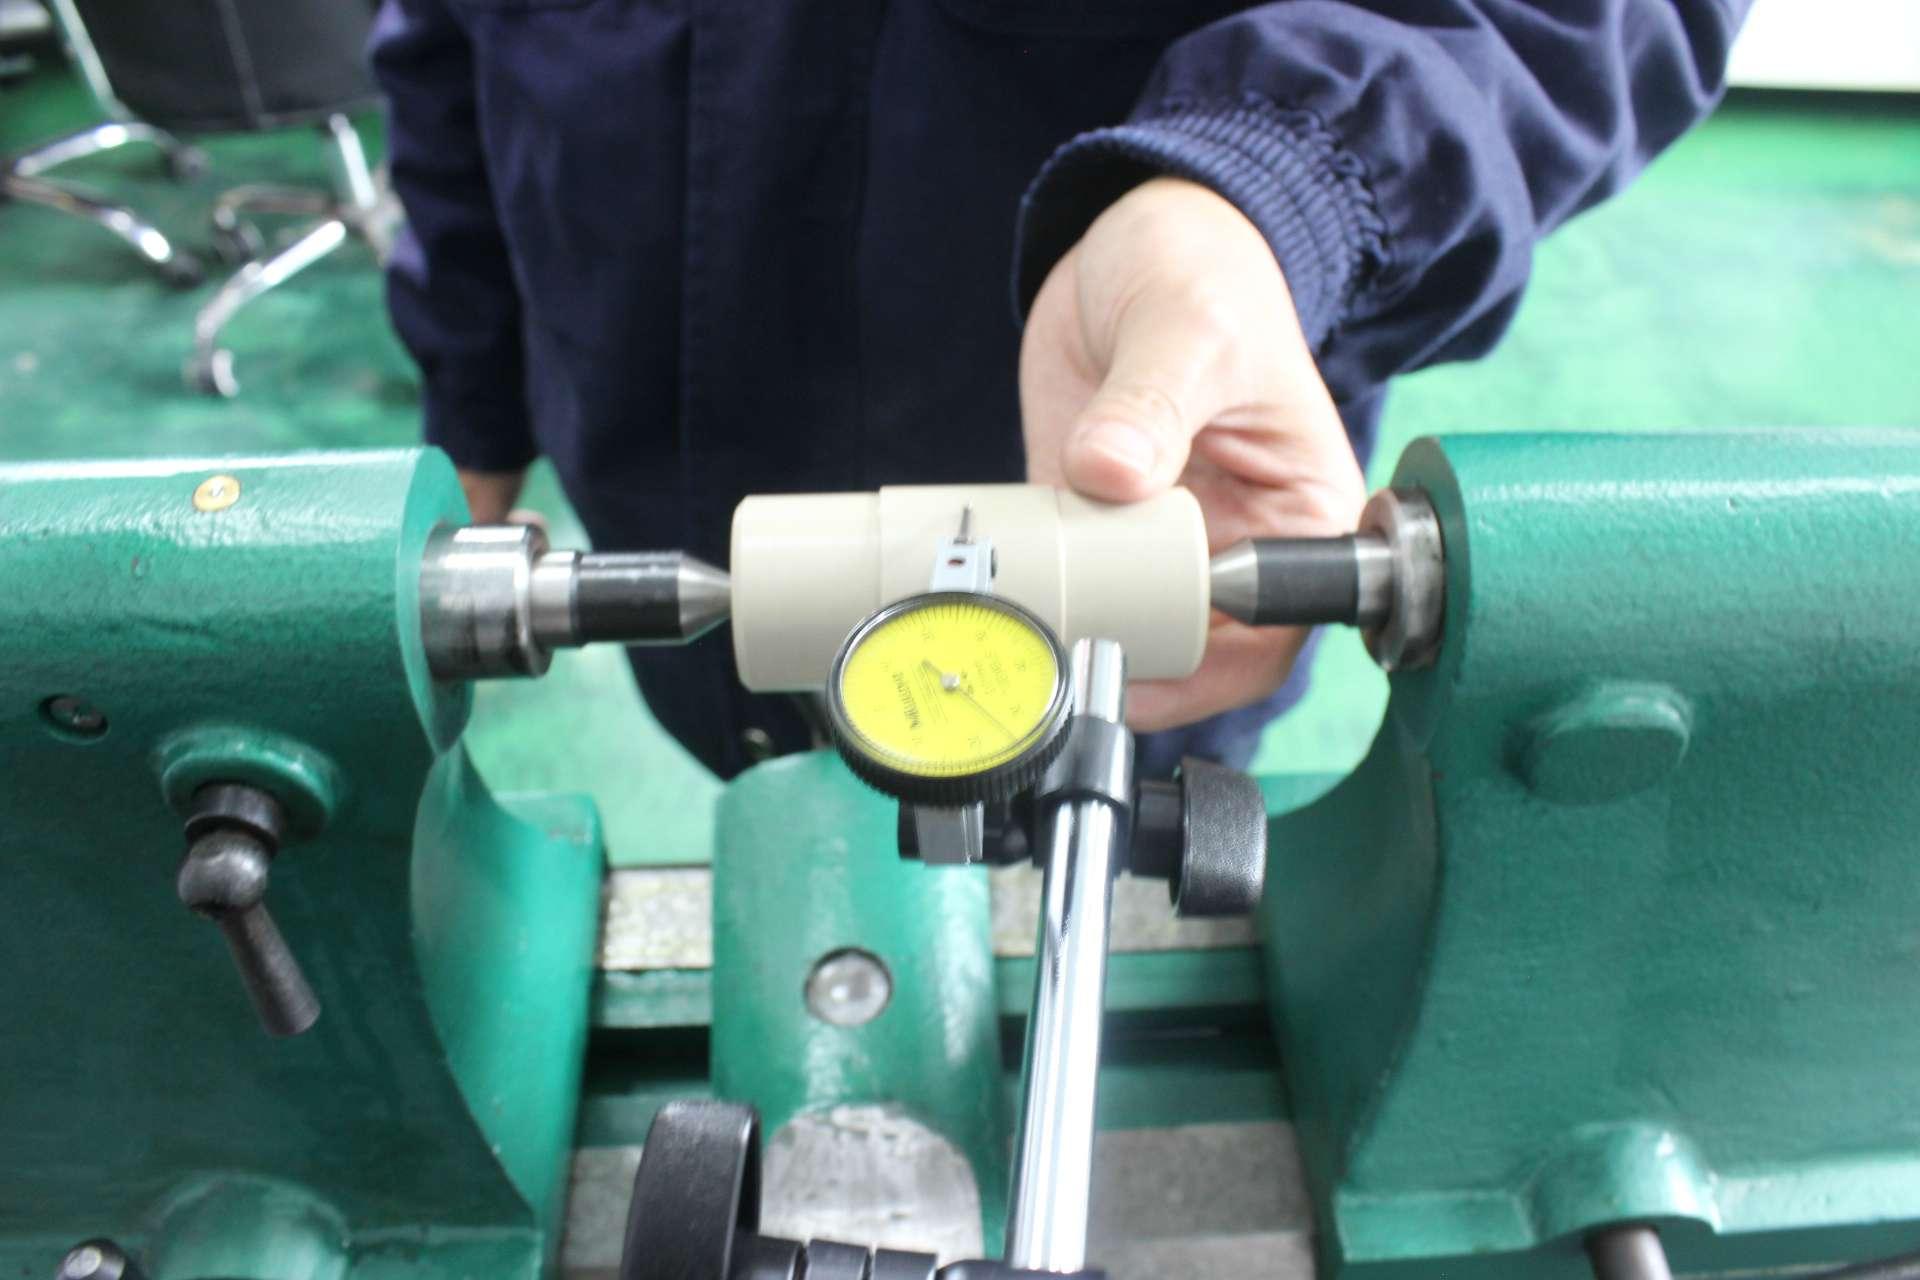 PEEK(聚醚醚酮)机加工零件同轴度的检测方法介绍